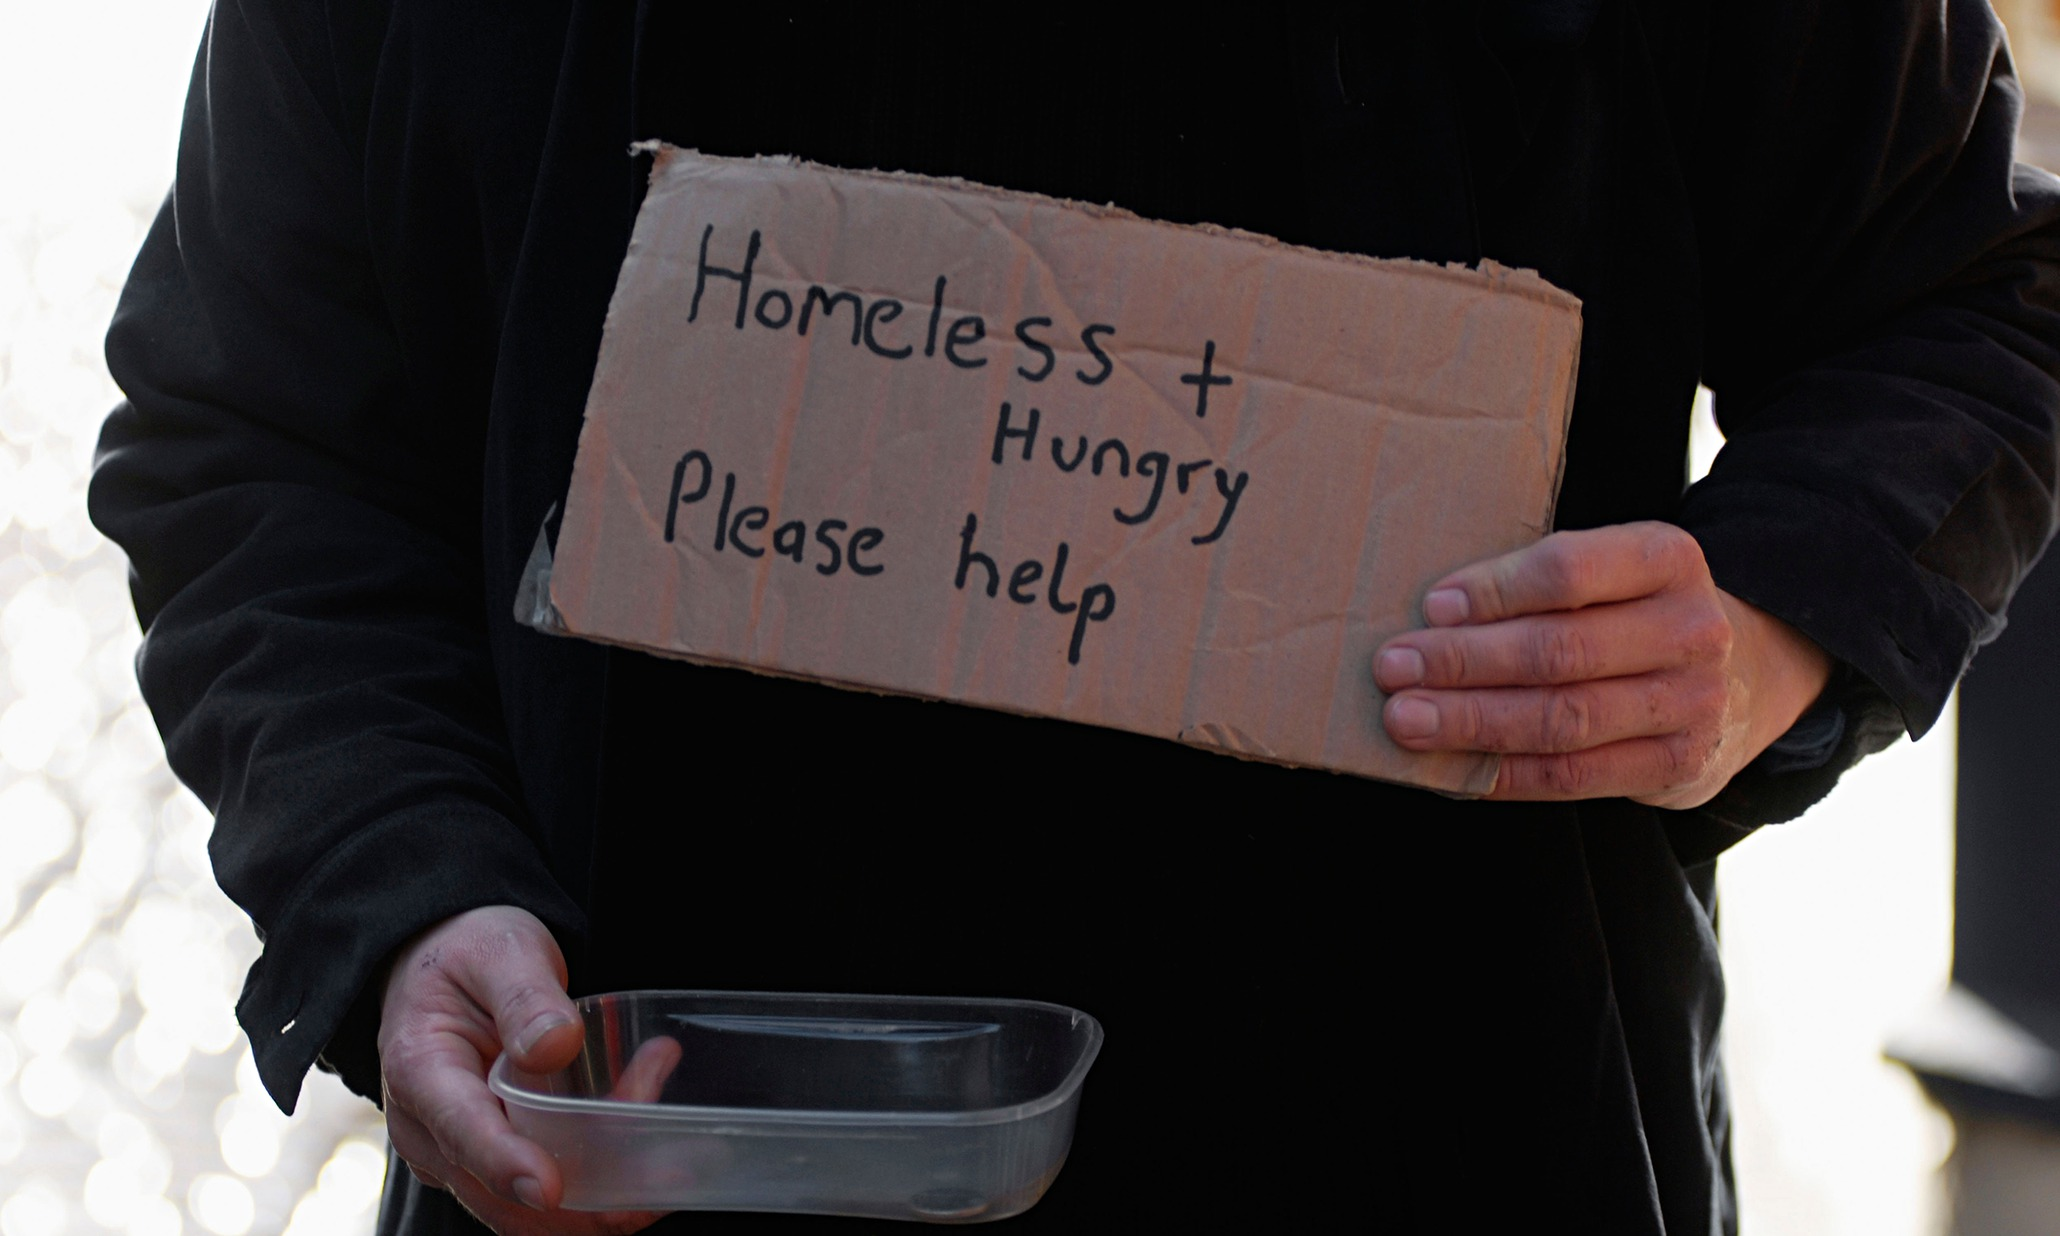 Homeless and an alcoho...